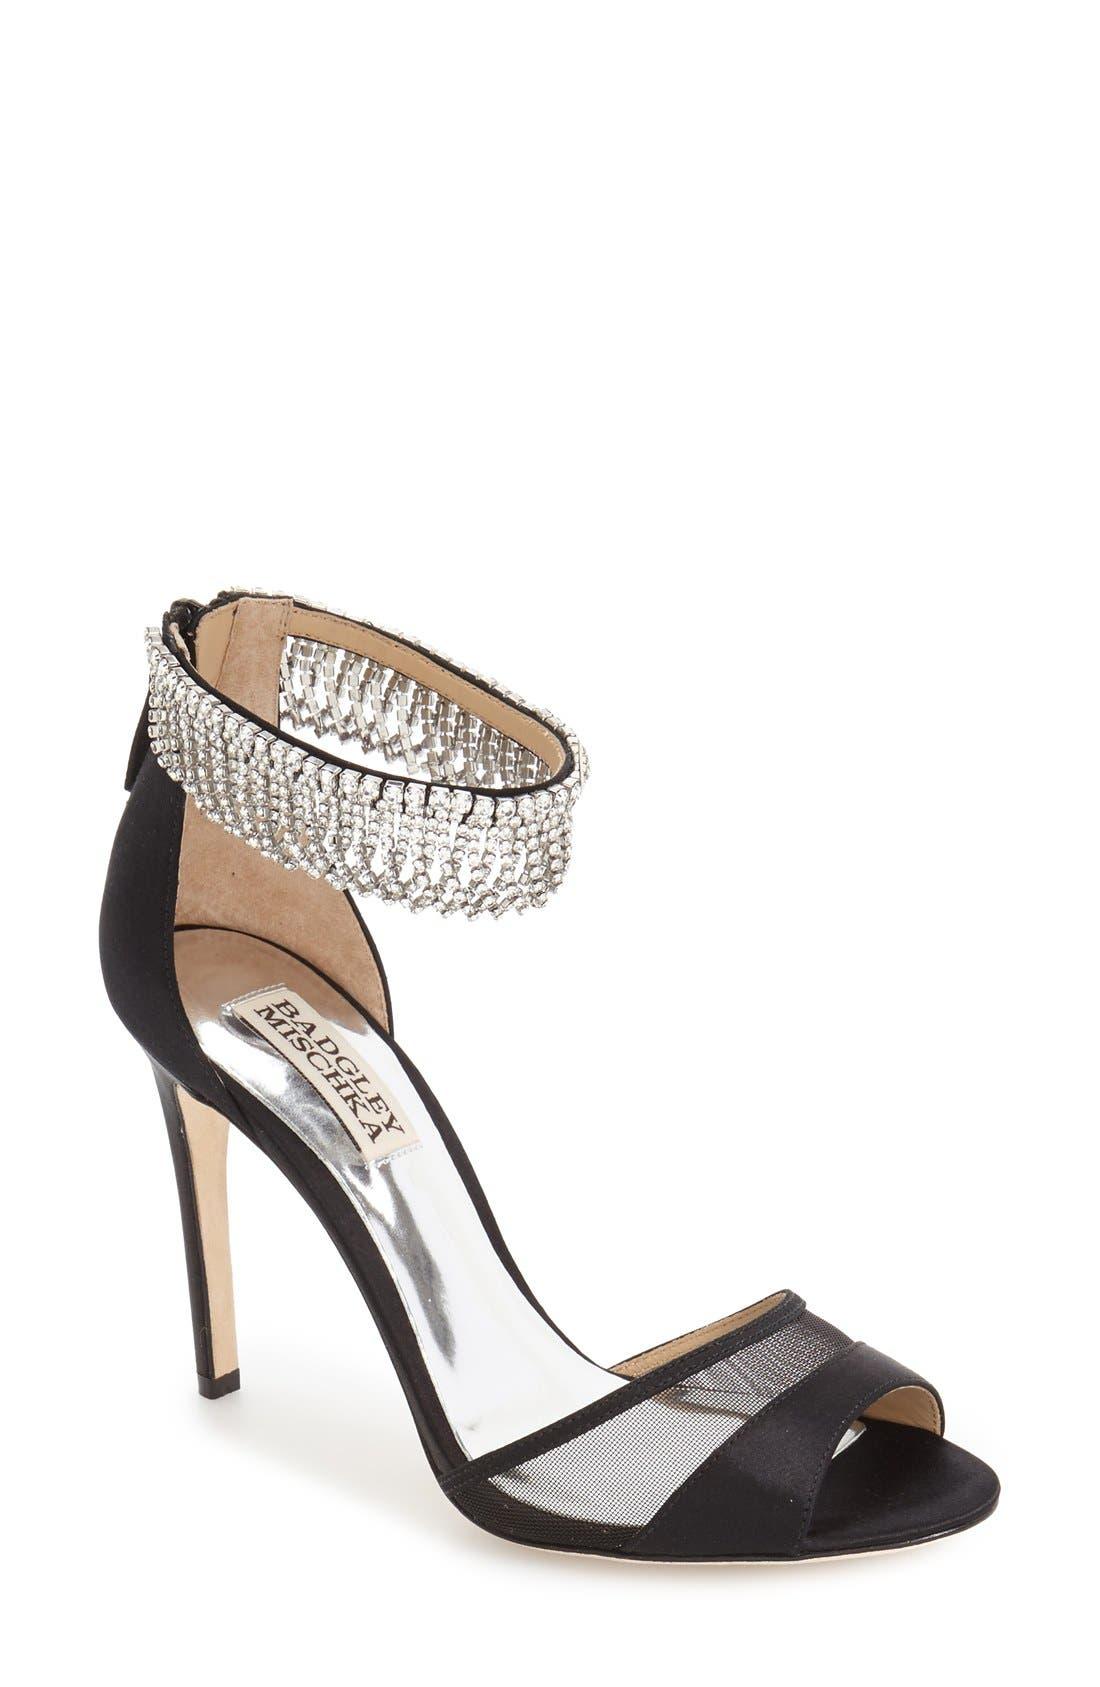 Alternate Image 1 Selected - Badgley Mischka 'Gazelle' Ankle Strap Sandal (Women)